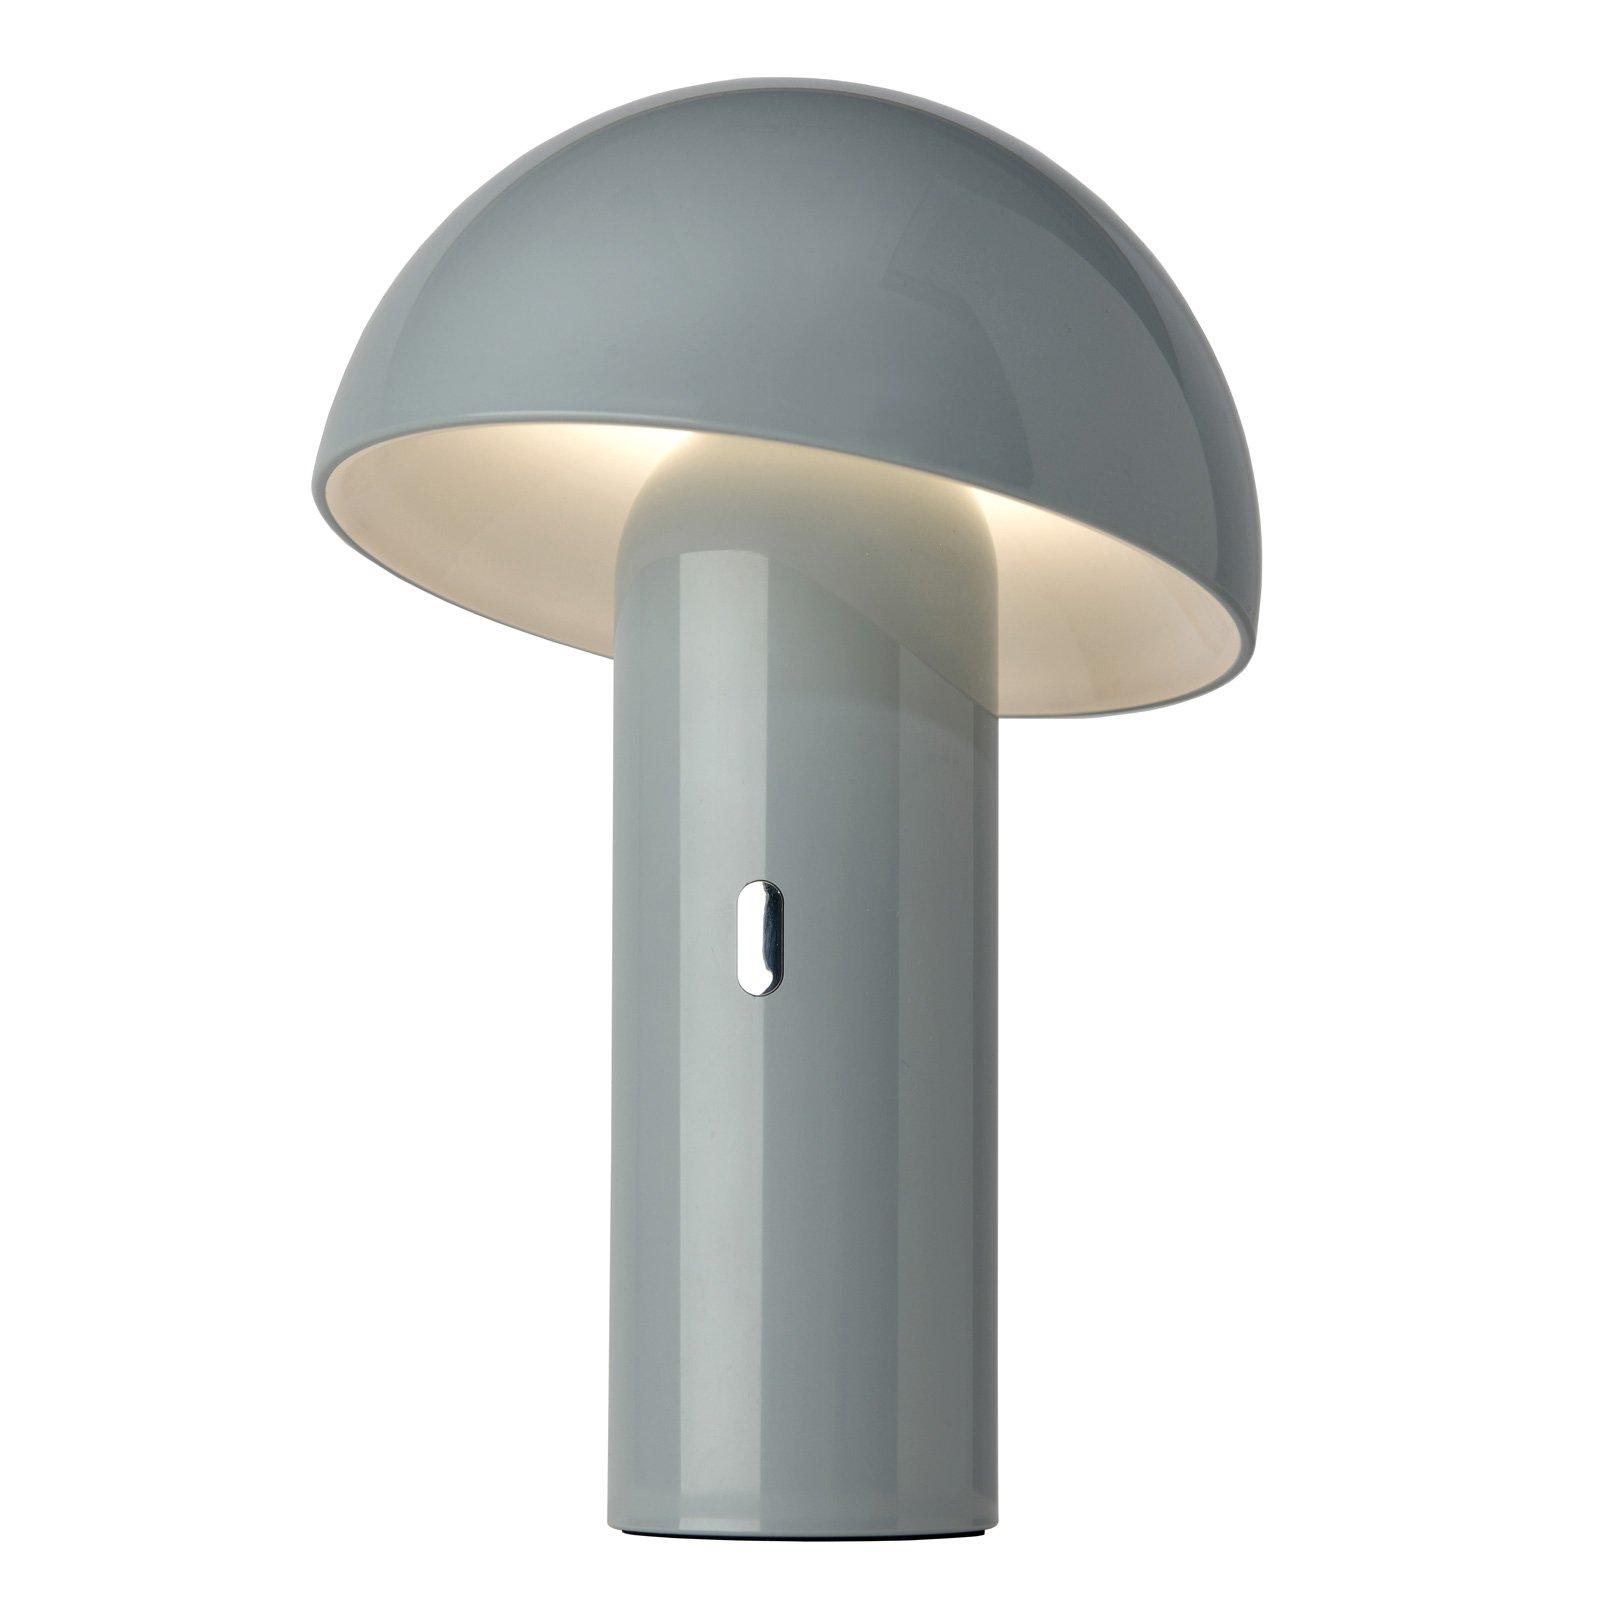 LED-bordlampe Svamp med batteri, dreibar, grå